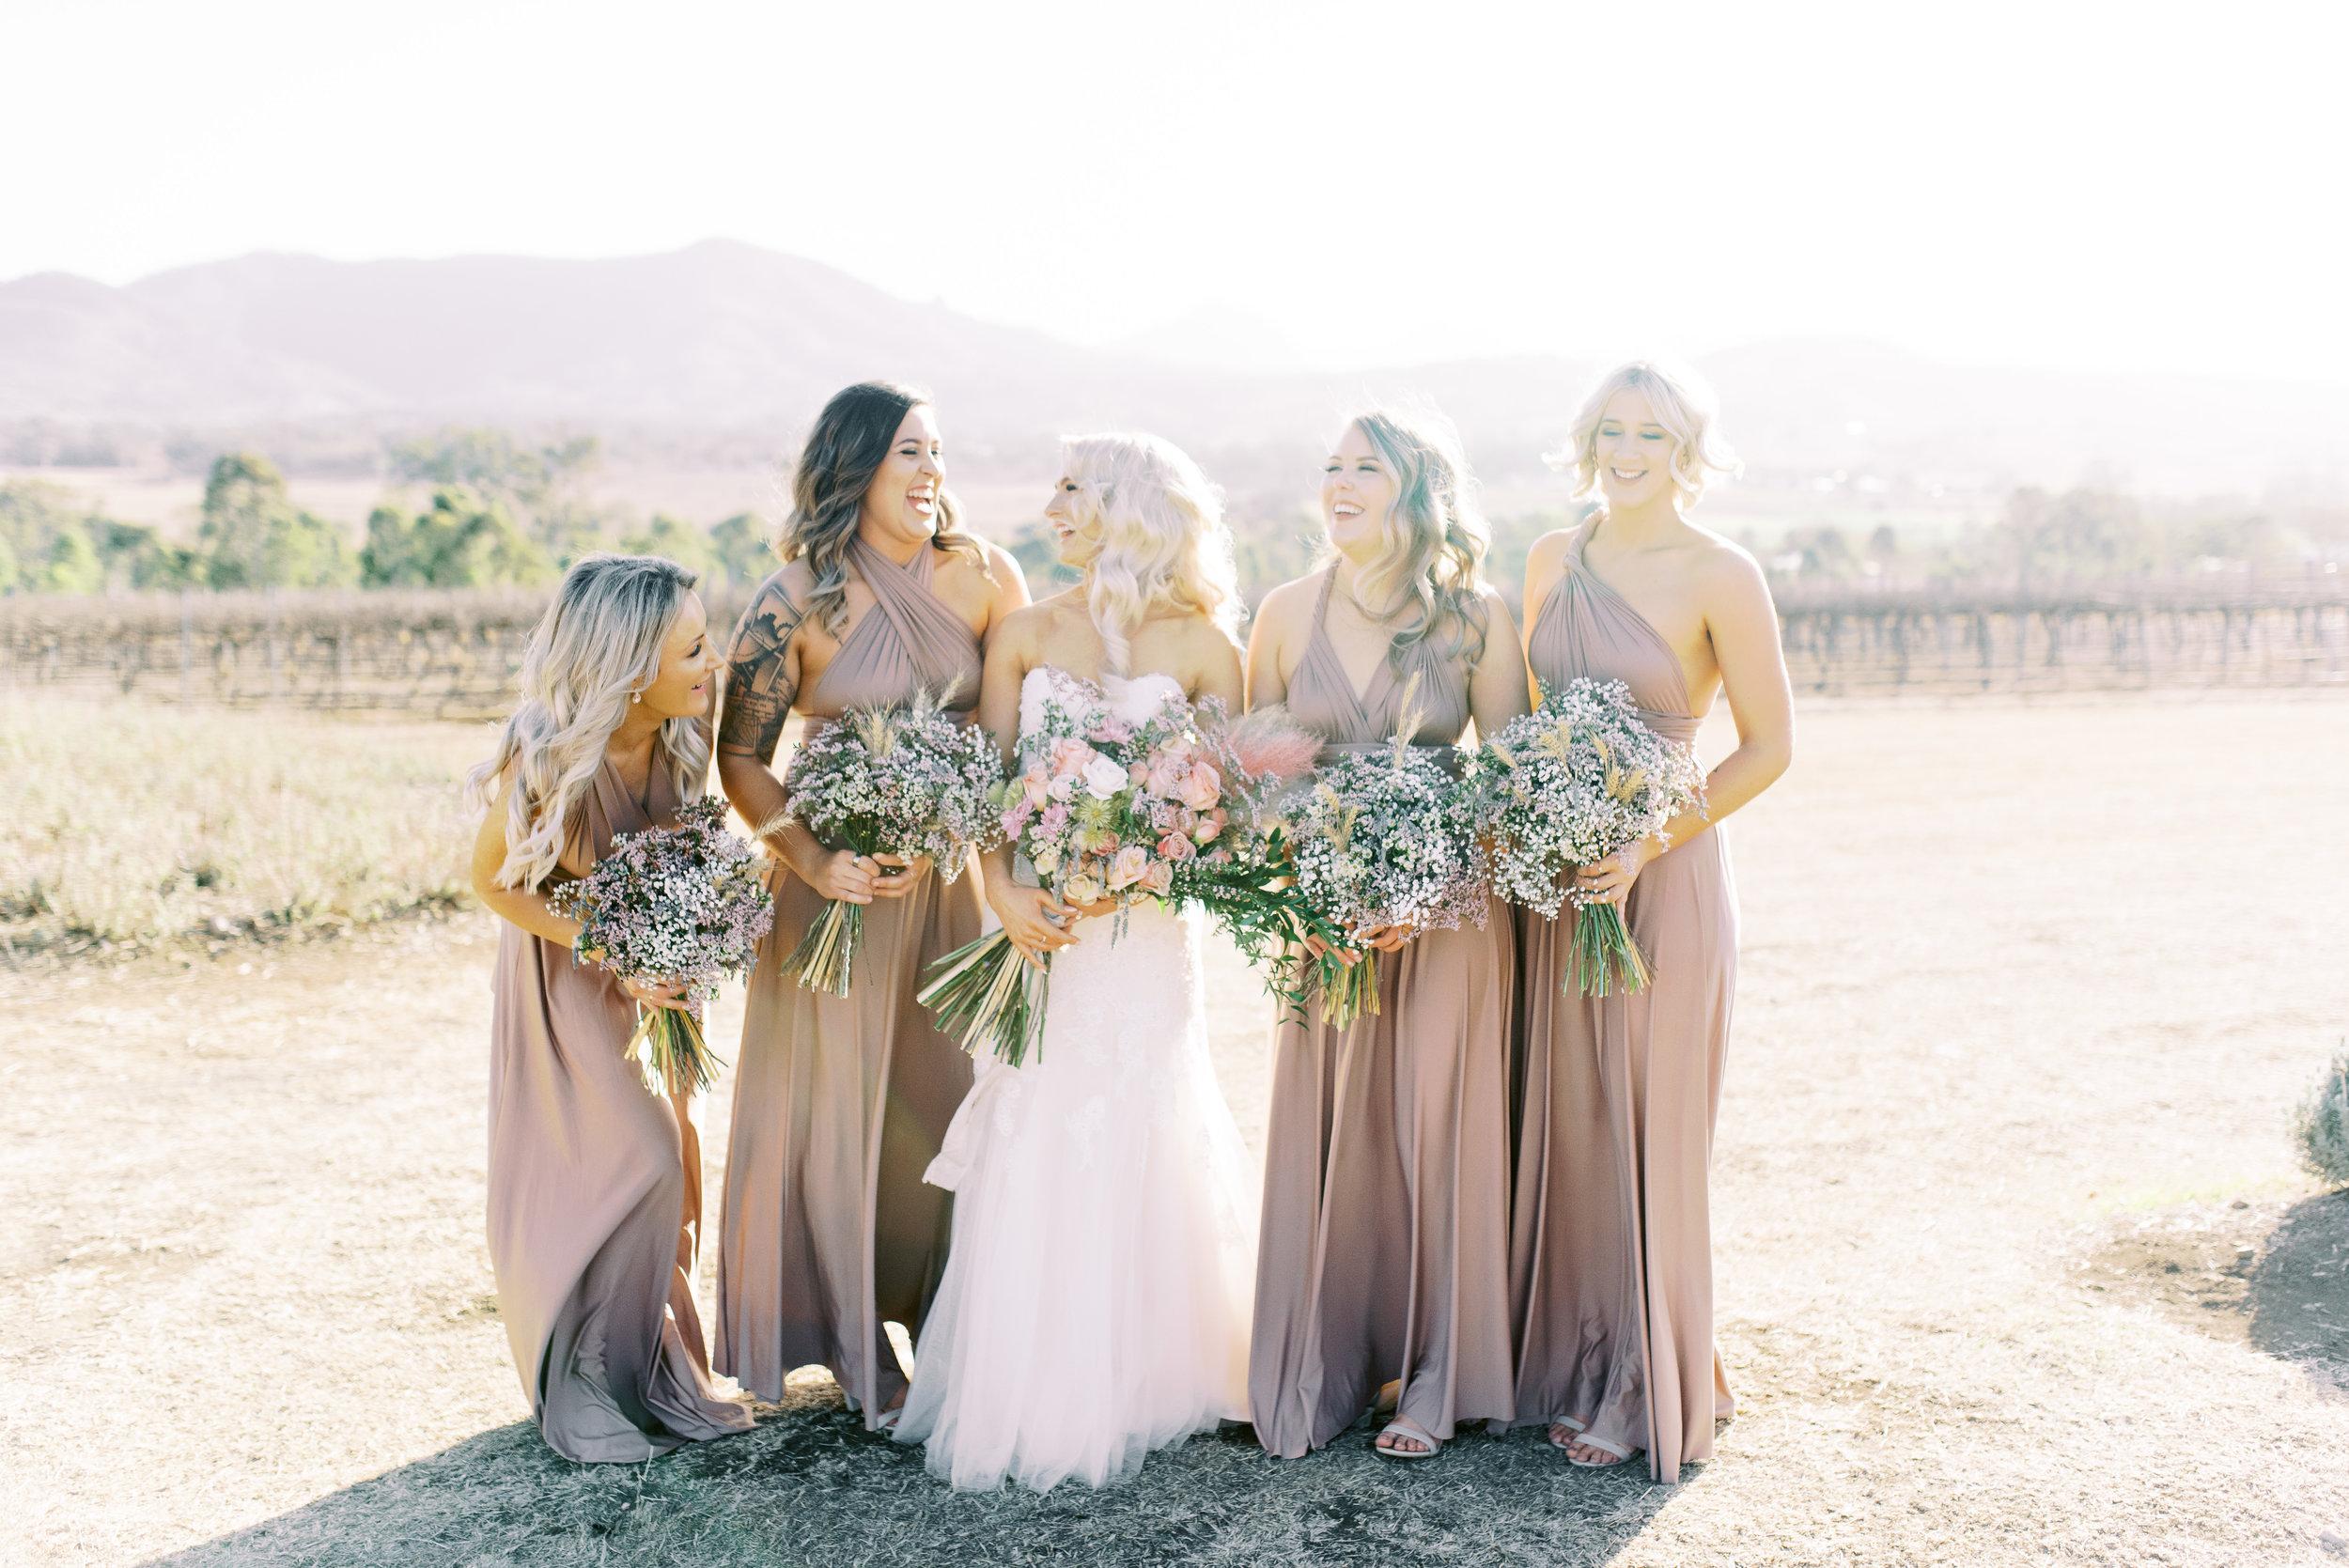 Kooroomba-Vineyard-Lavender-Farm-Wedding-Fine-Art-Lauren-Olivia-53.jpg